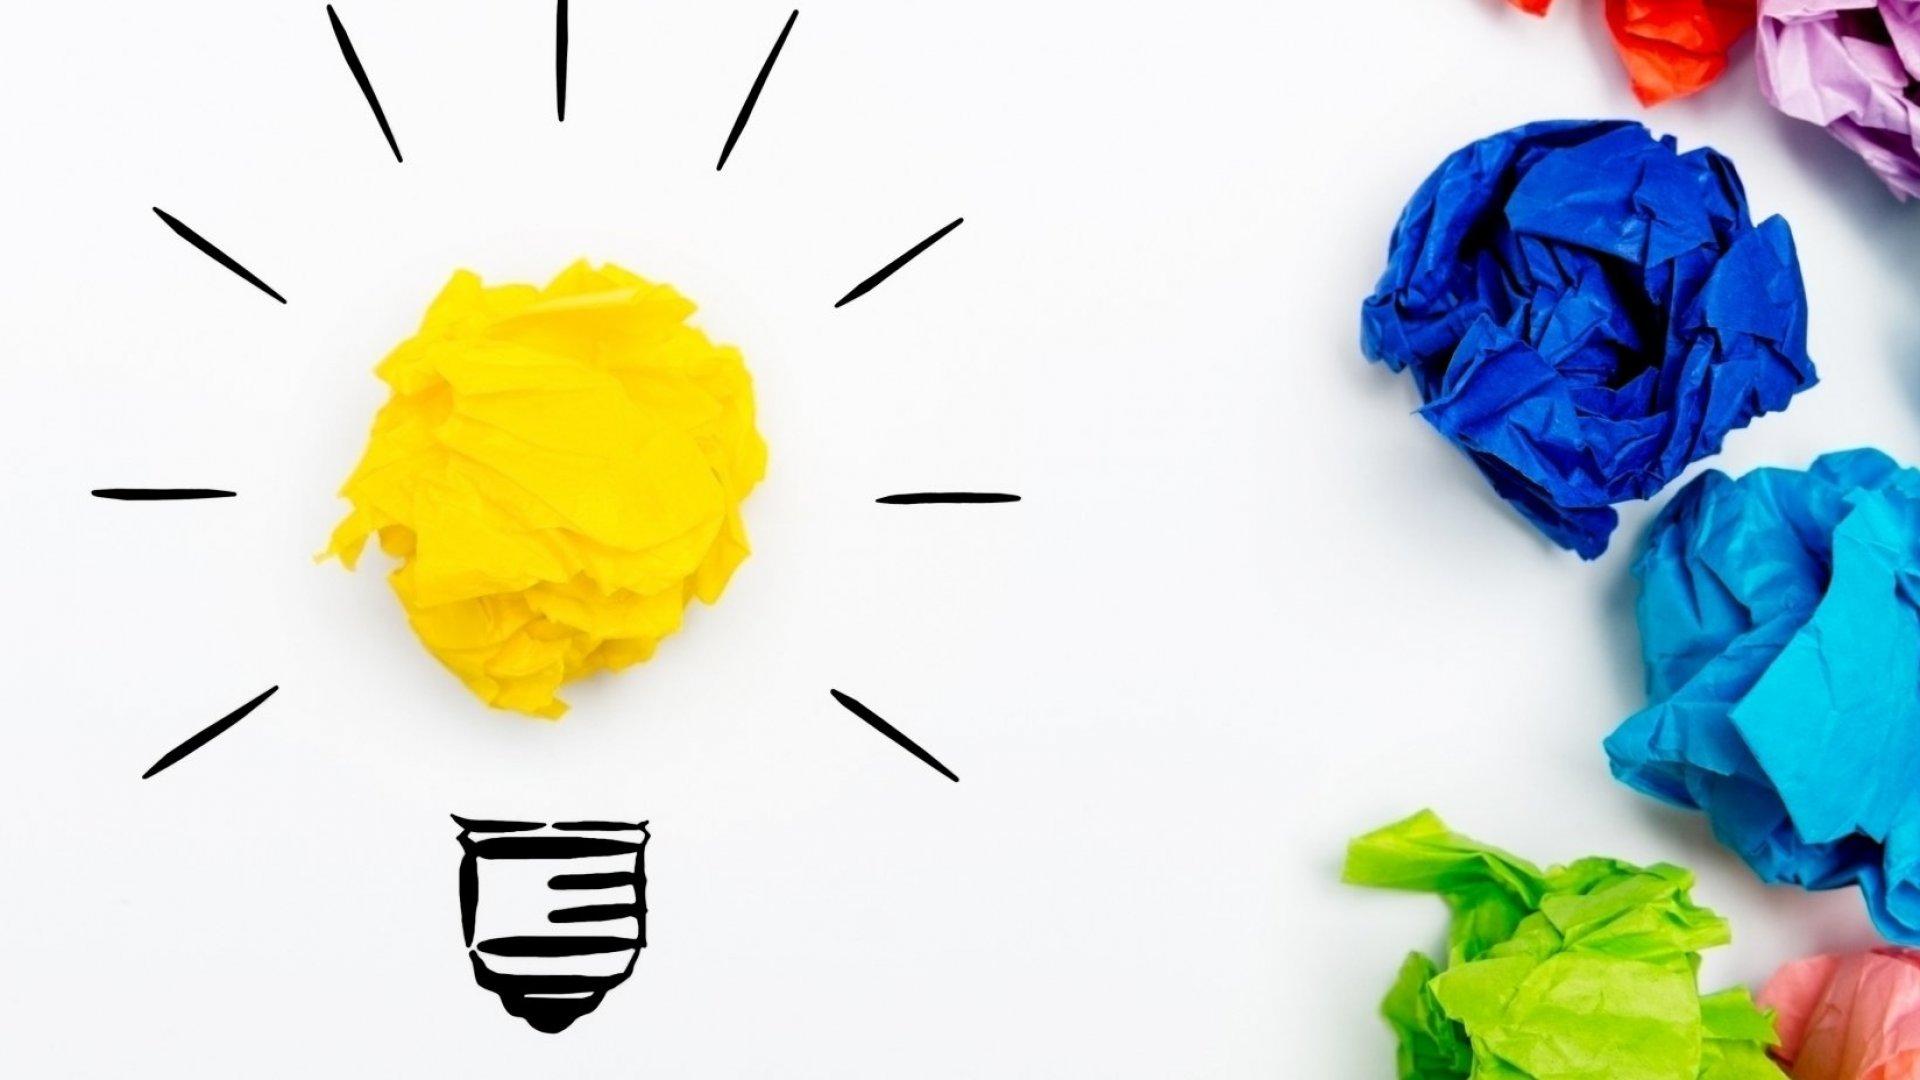 5 Ways to Overcome a Creative Block